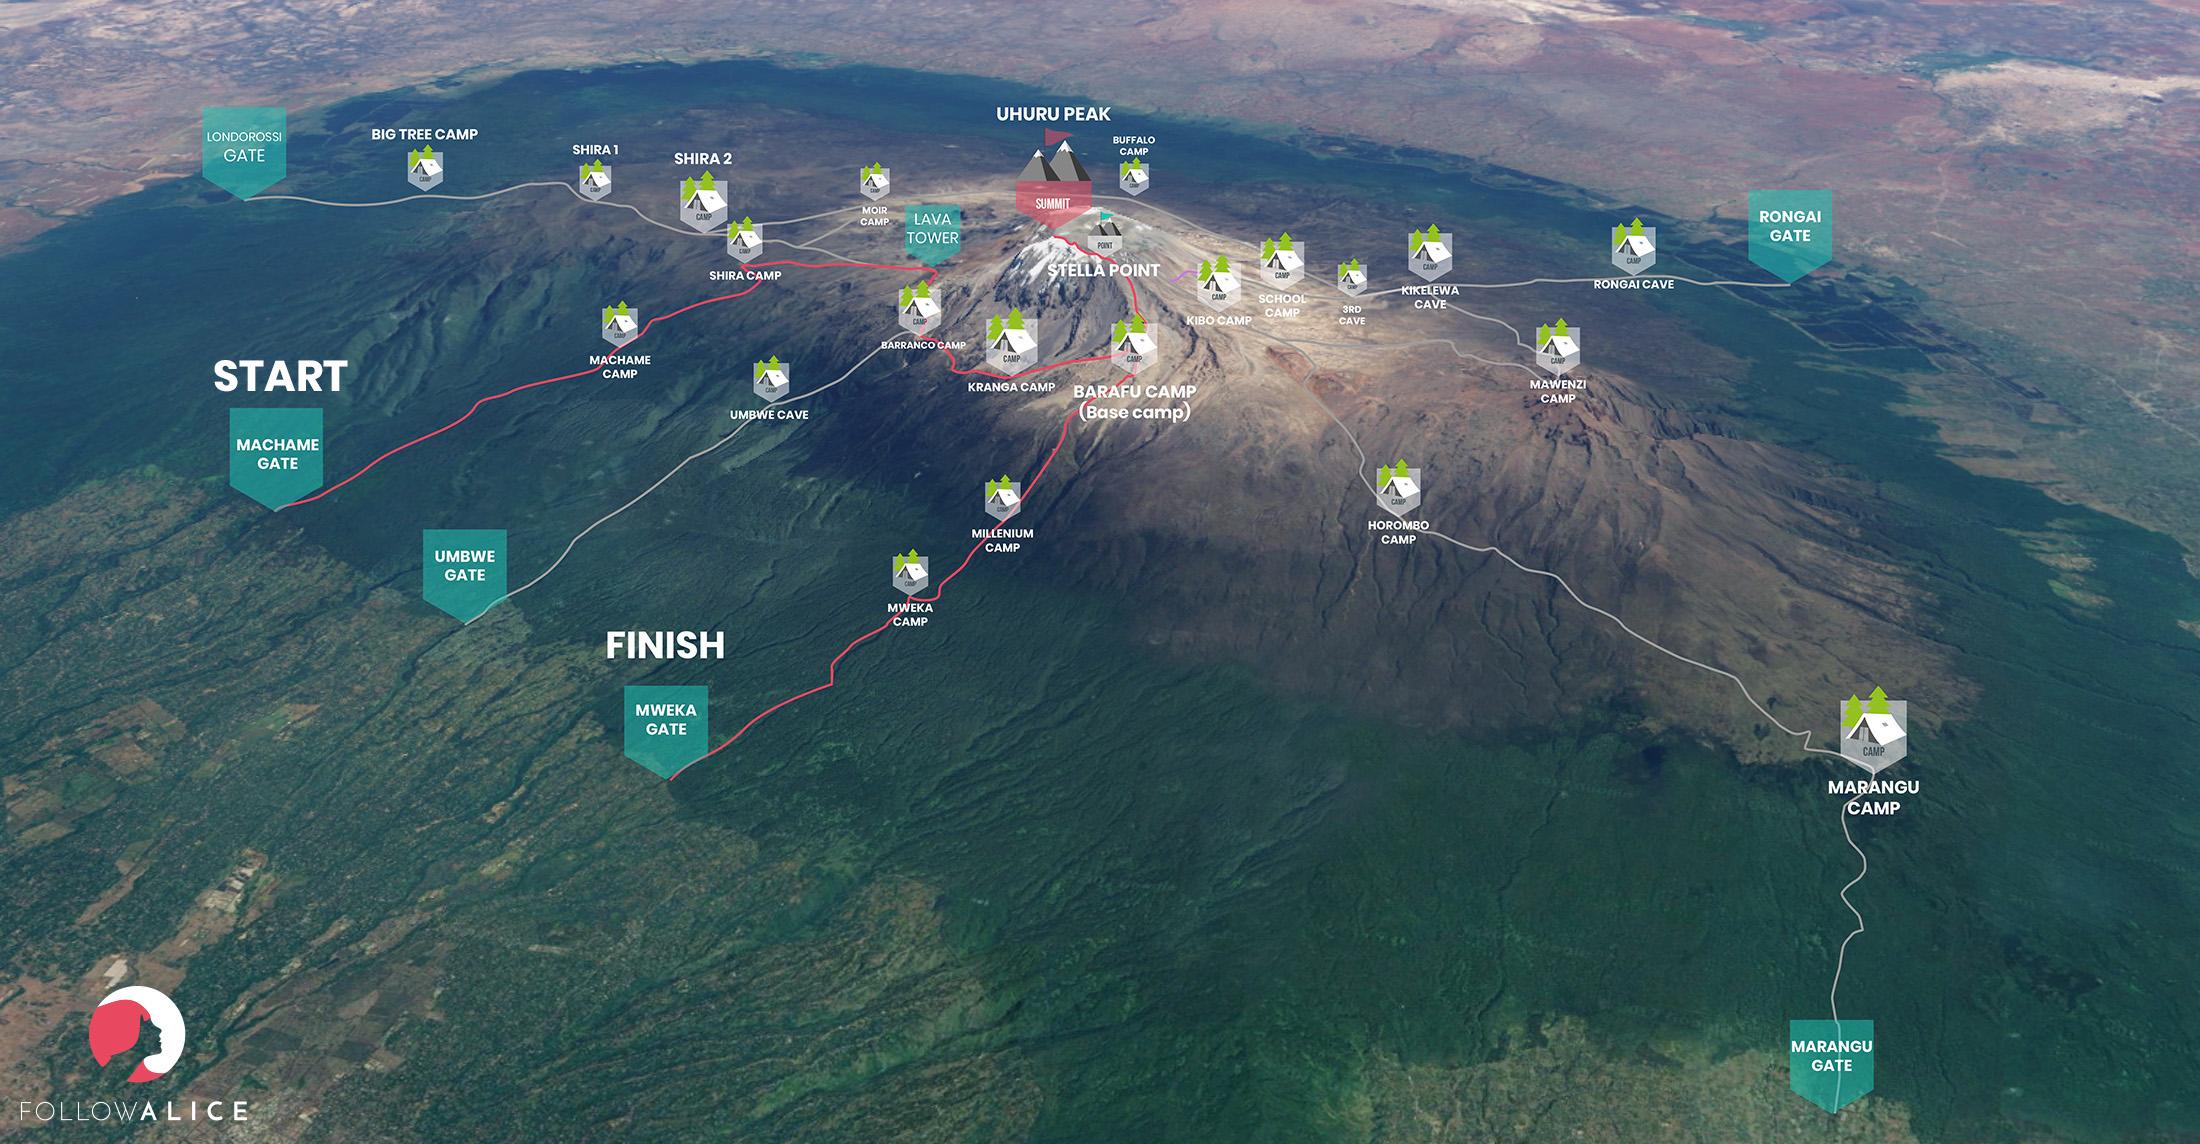 mt kilimanjaro map go back to google maps - kilimanjaro routes differences between kilimanjaro routes and kilimanjaromachame route map kilimanjaro routes mt kilimanjaro map mt kilimanjaro map